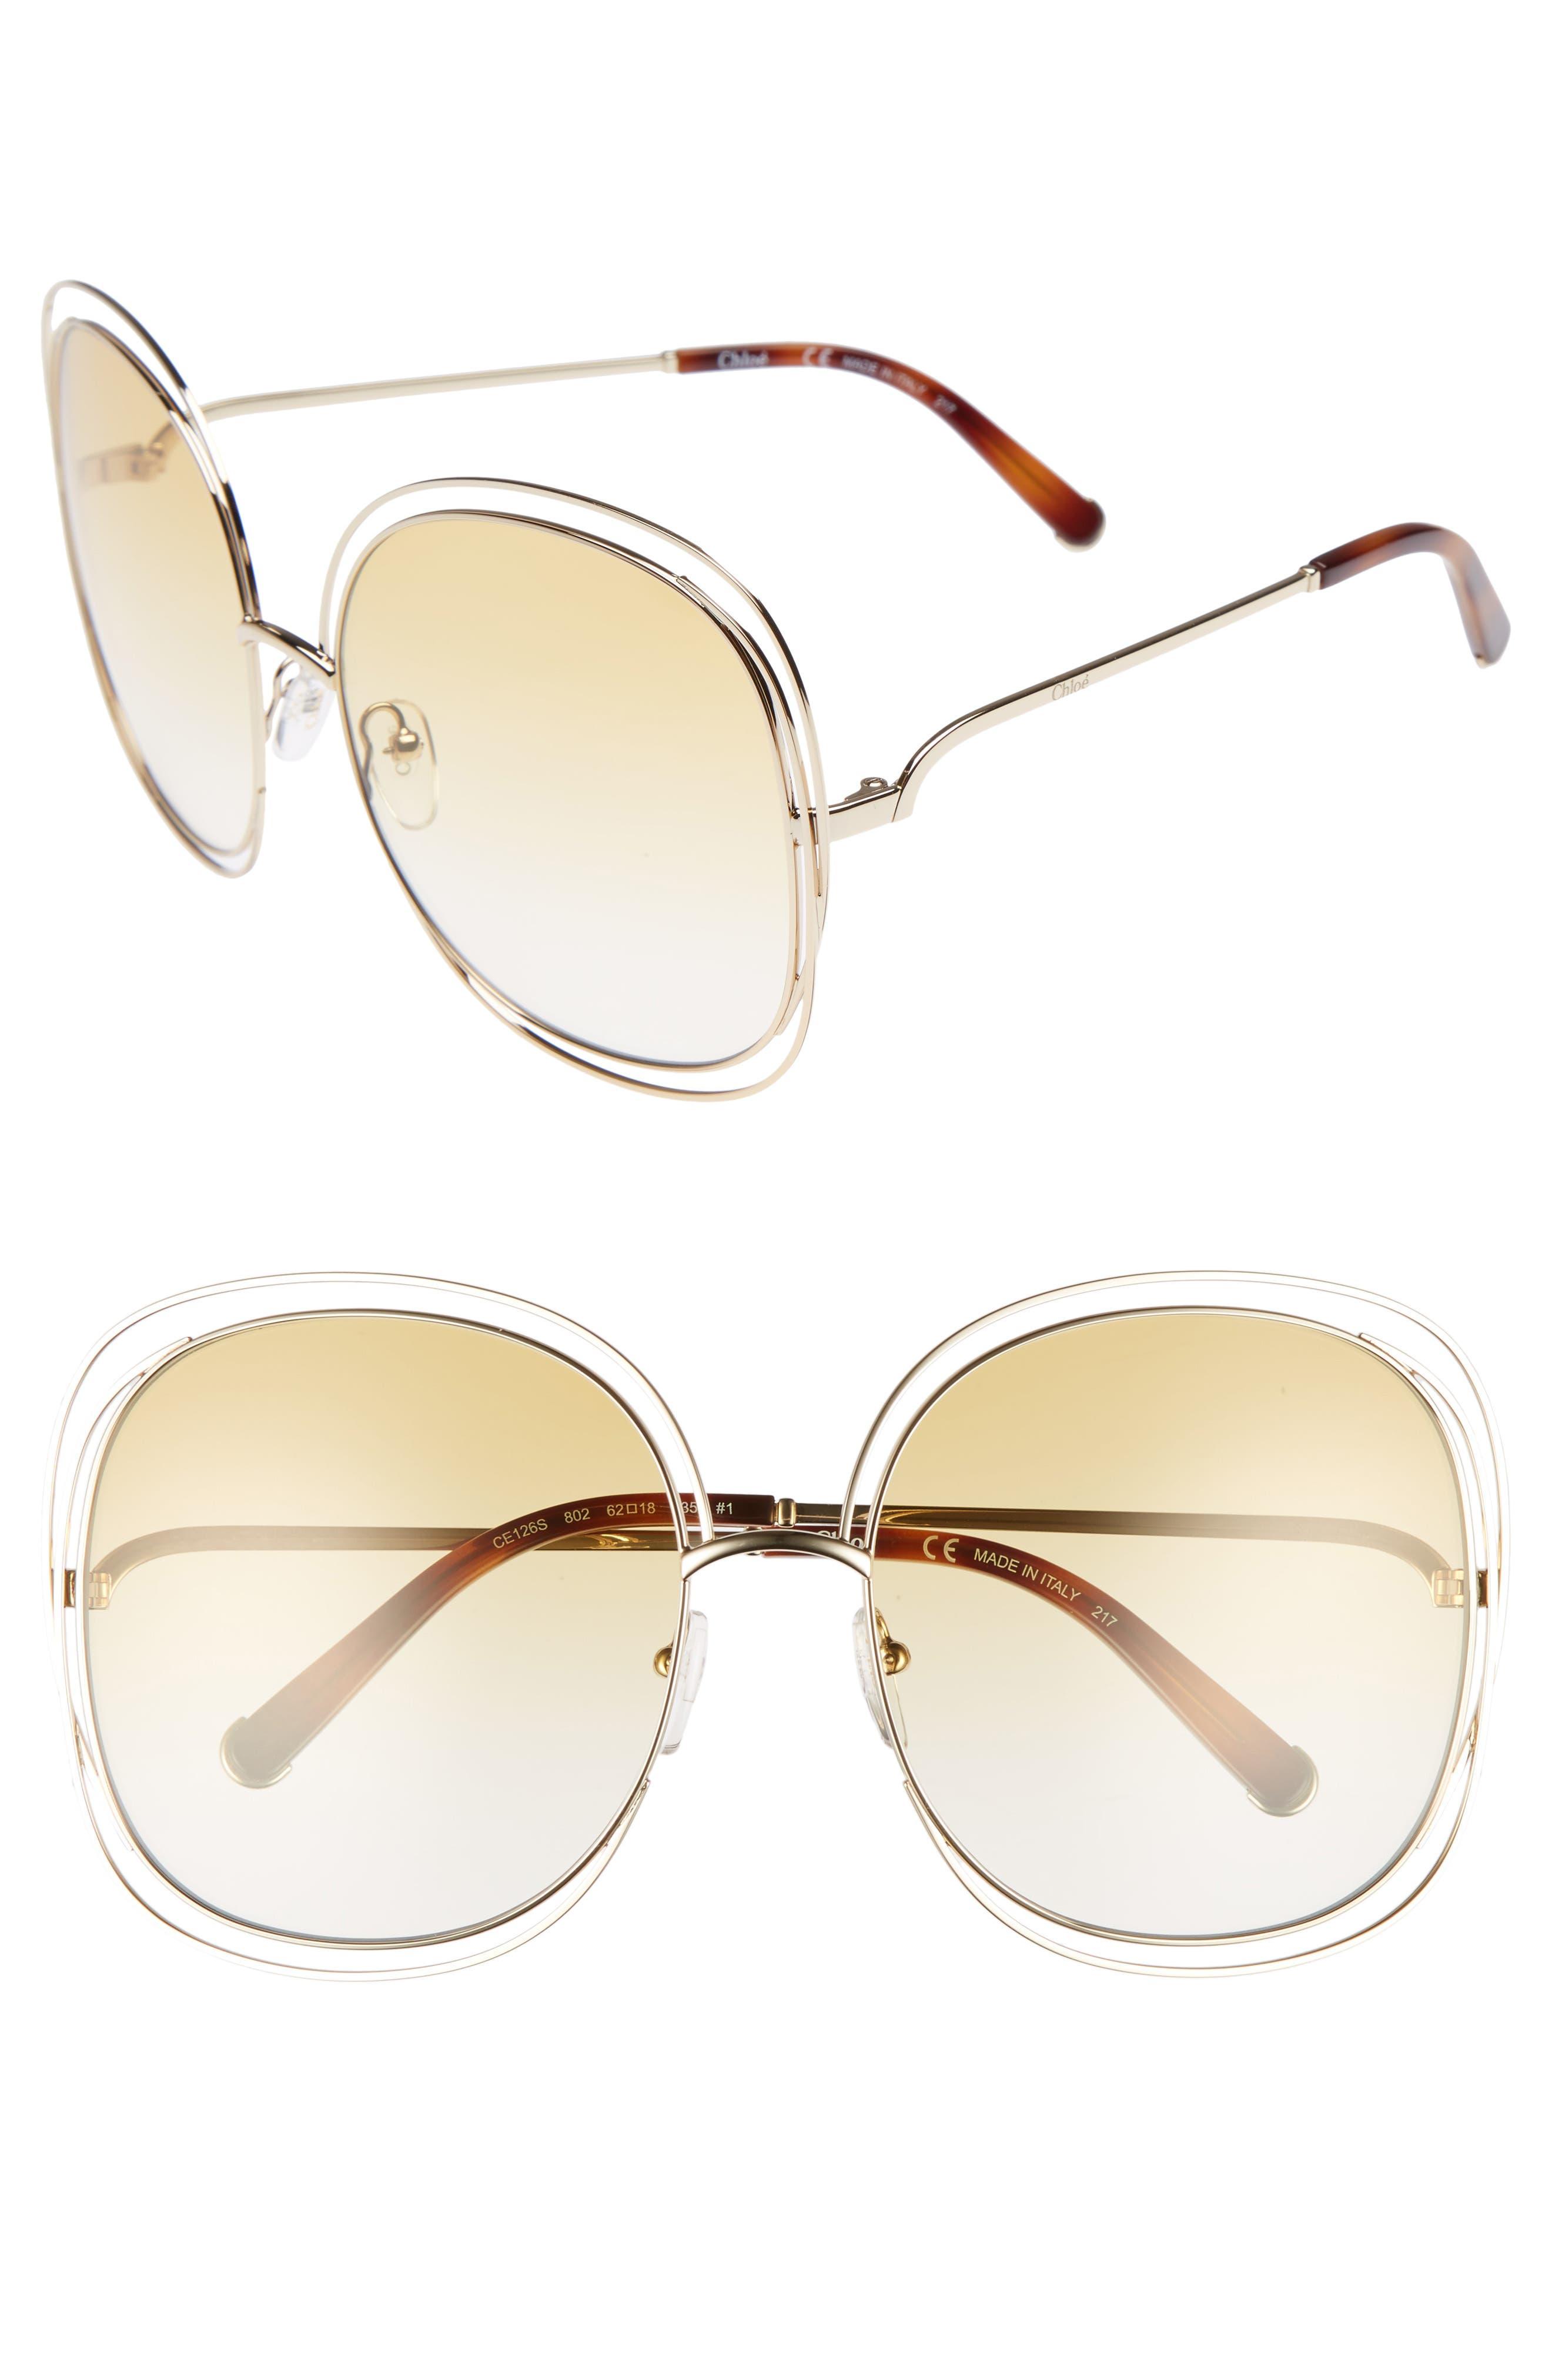 Carlina 62mm Oversize Sunglasses,                         Main,                         color, 714